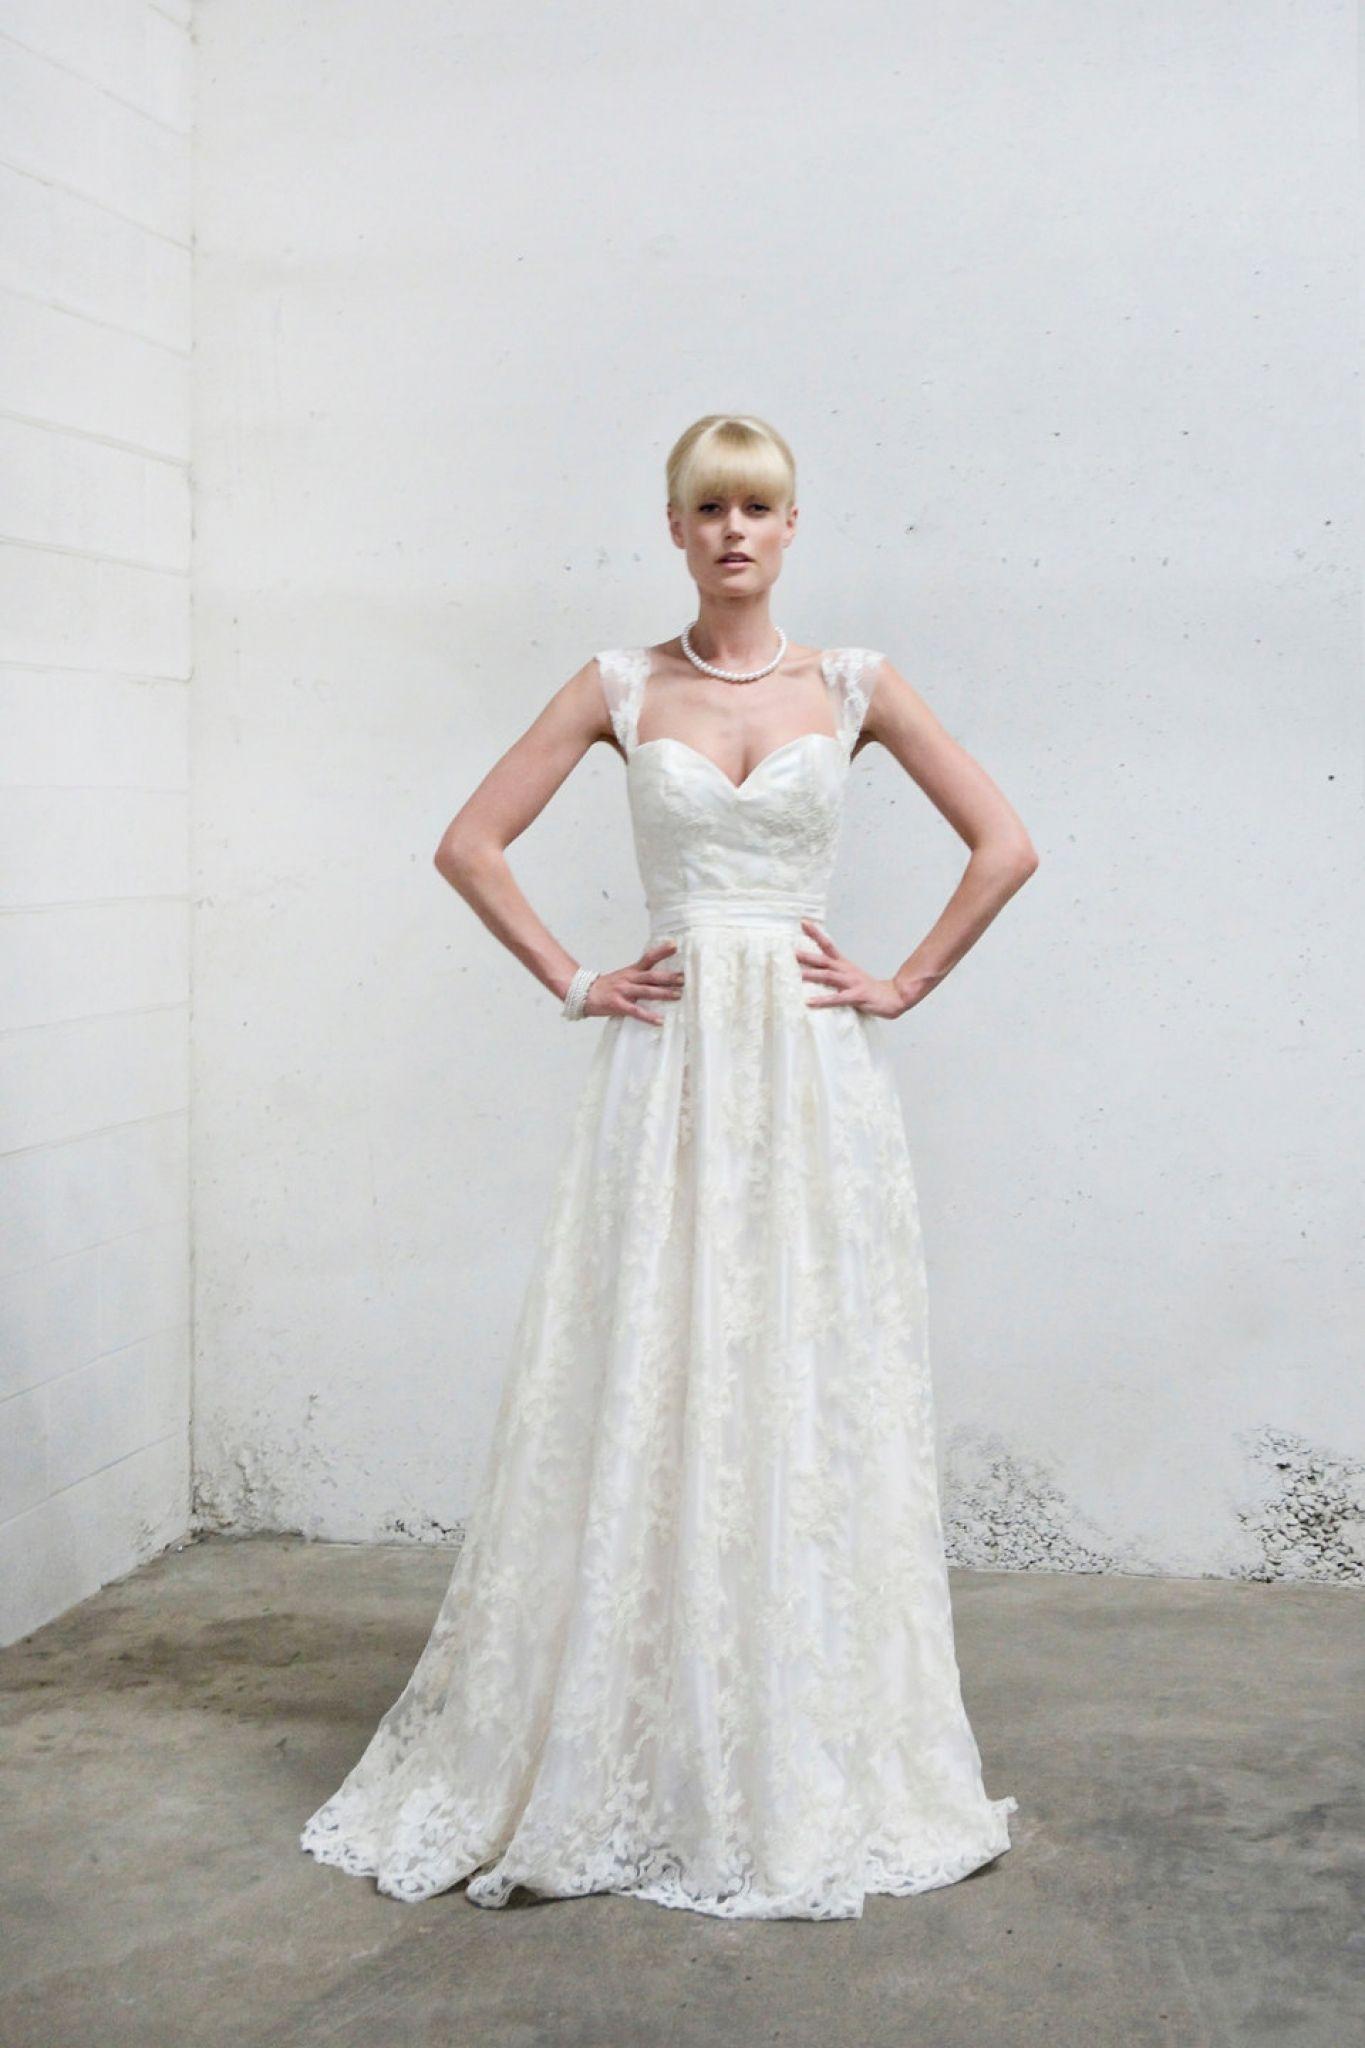 long flowy wedding dresses - women\'s dresses for weddings Check more ...